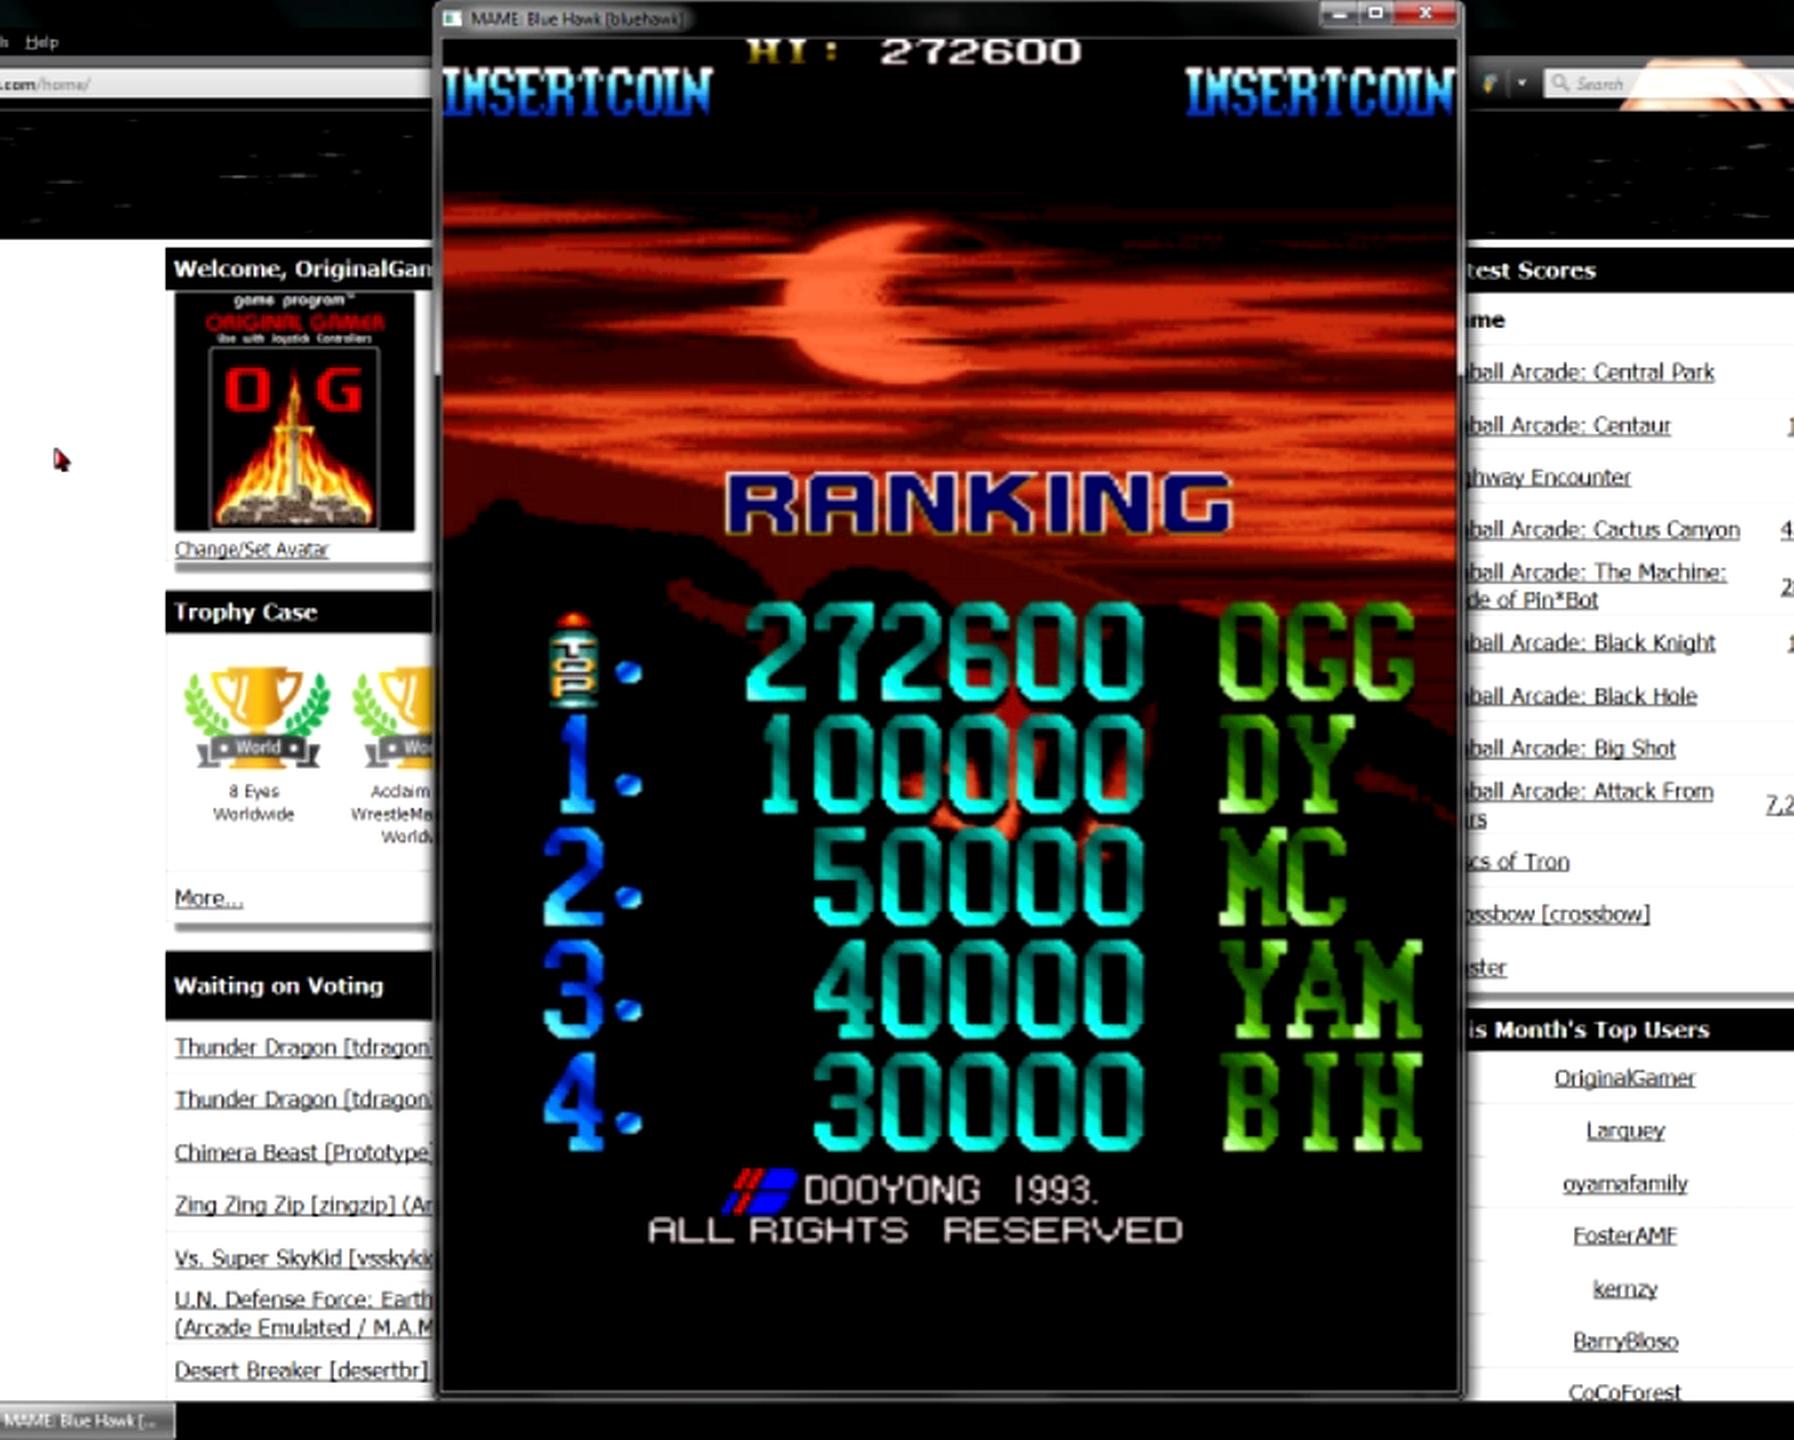 OriginalGamer: Blue Hawk [bluehawk] (Arcade Emulated / M.A.M.E.) 272,600 points on 2015-05-27 19:56:03